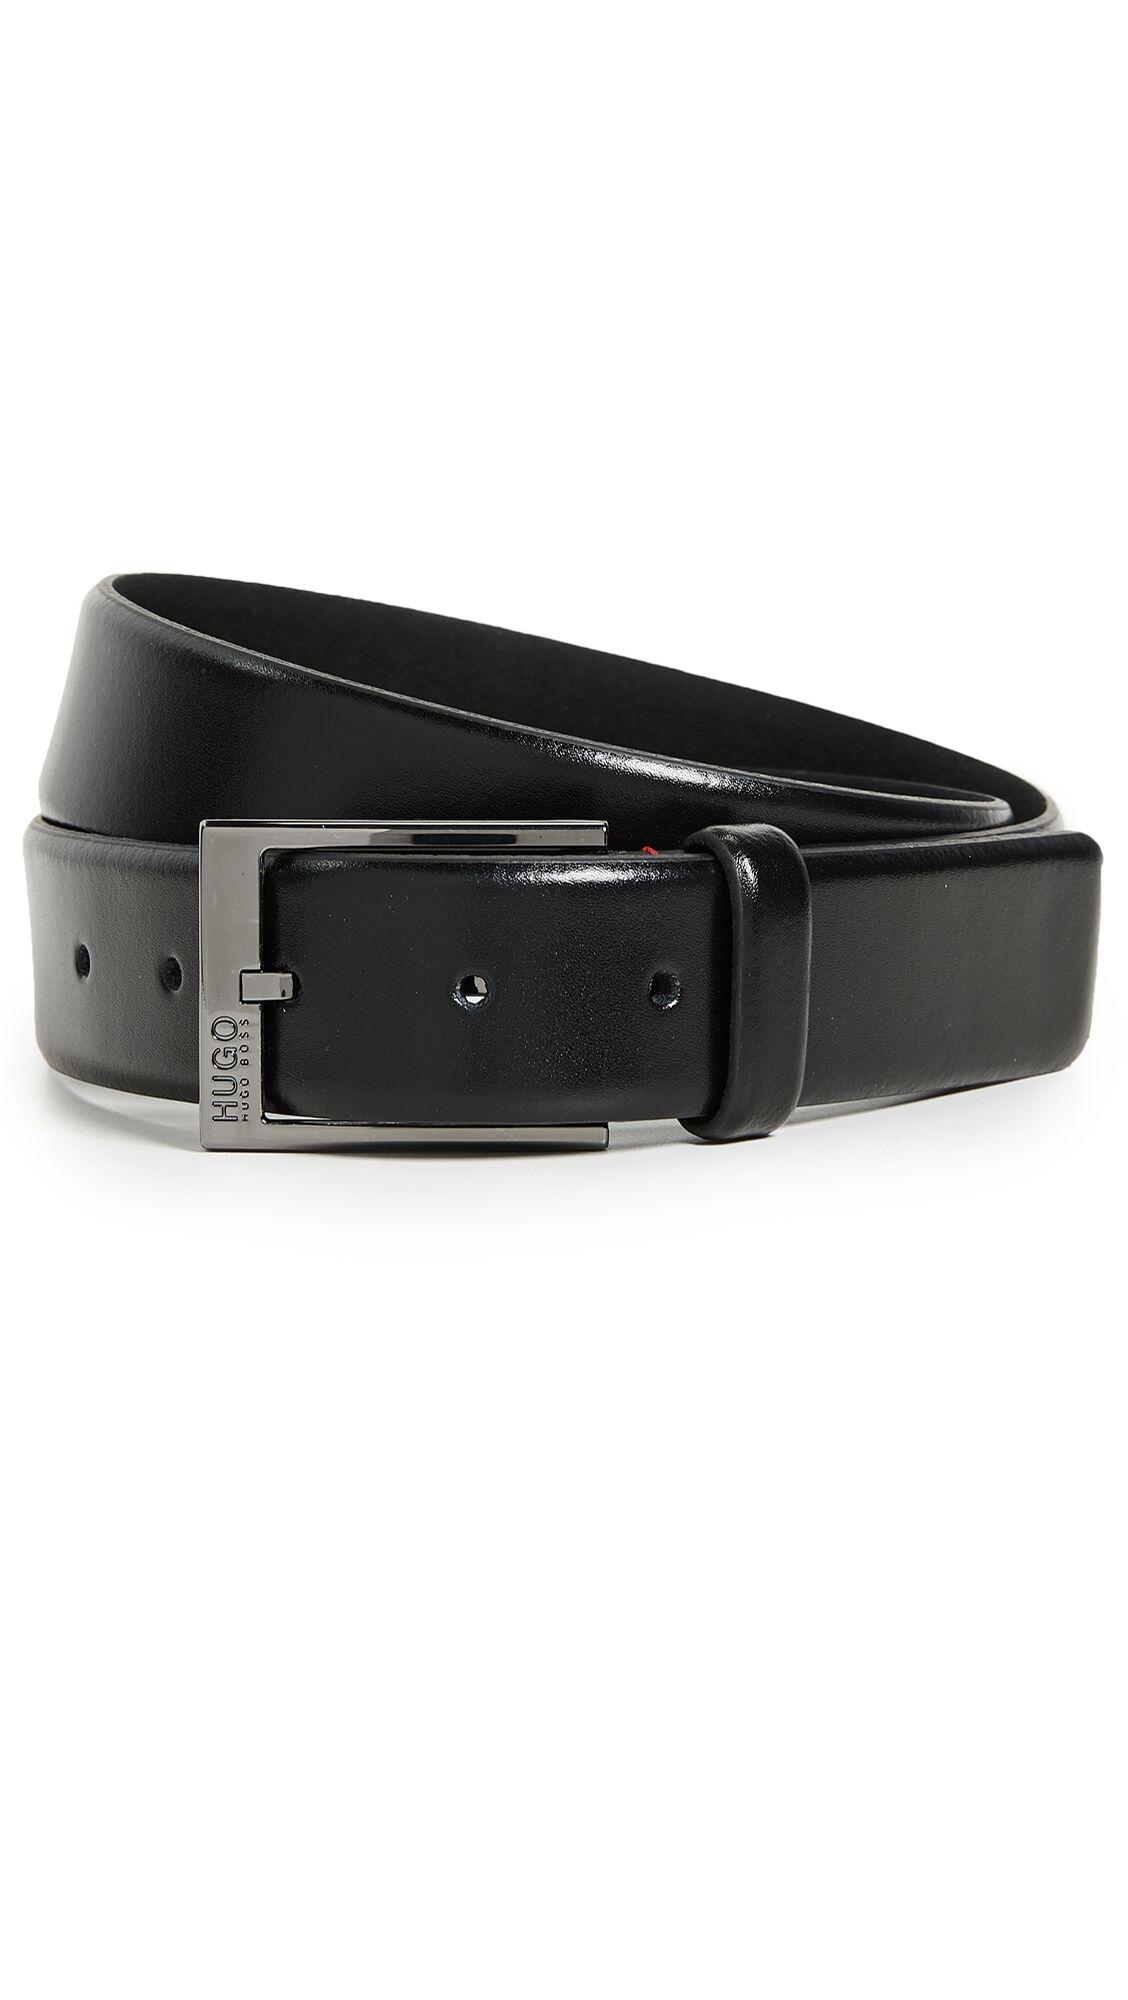 Hugo Boss Garney Smooth Leather Belt - Black - Size: 34